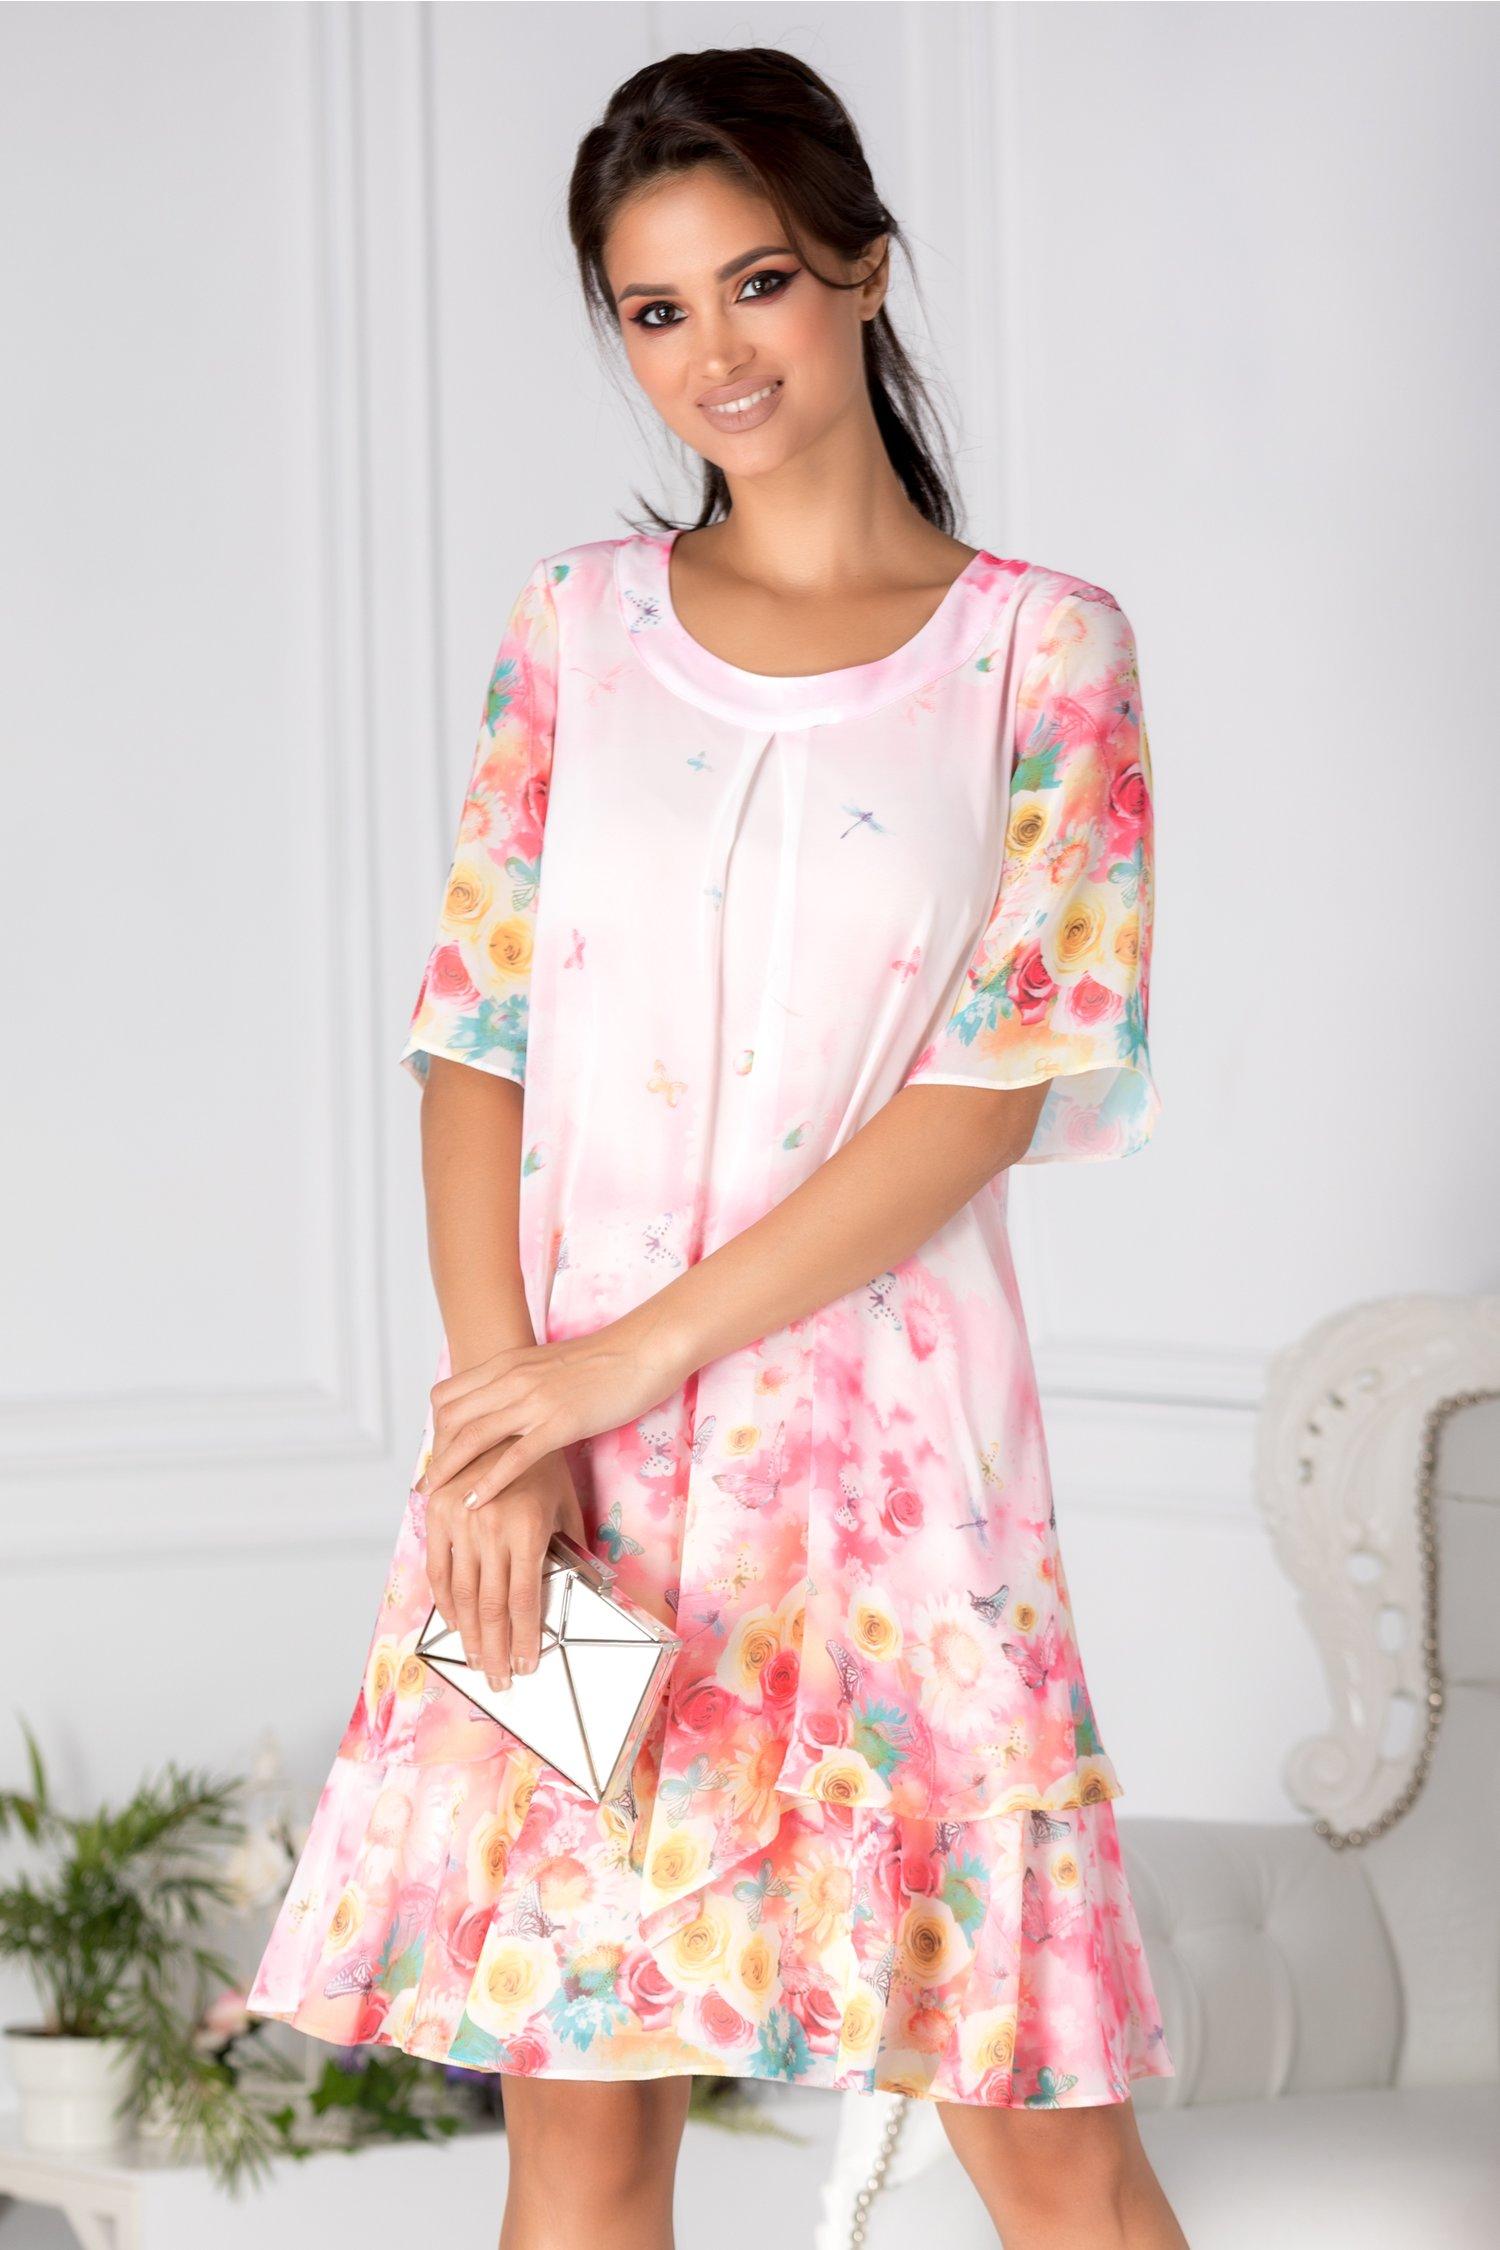 Rochie Reya vaporoasa roz cu trandafiri si fluturi colorati